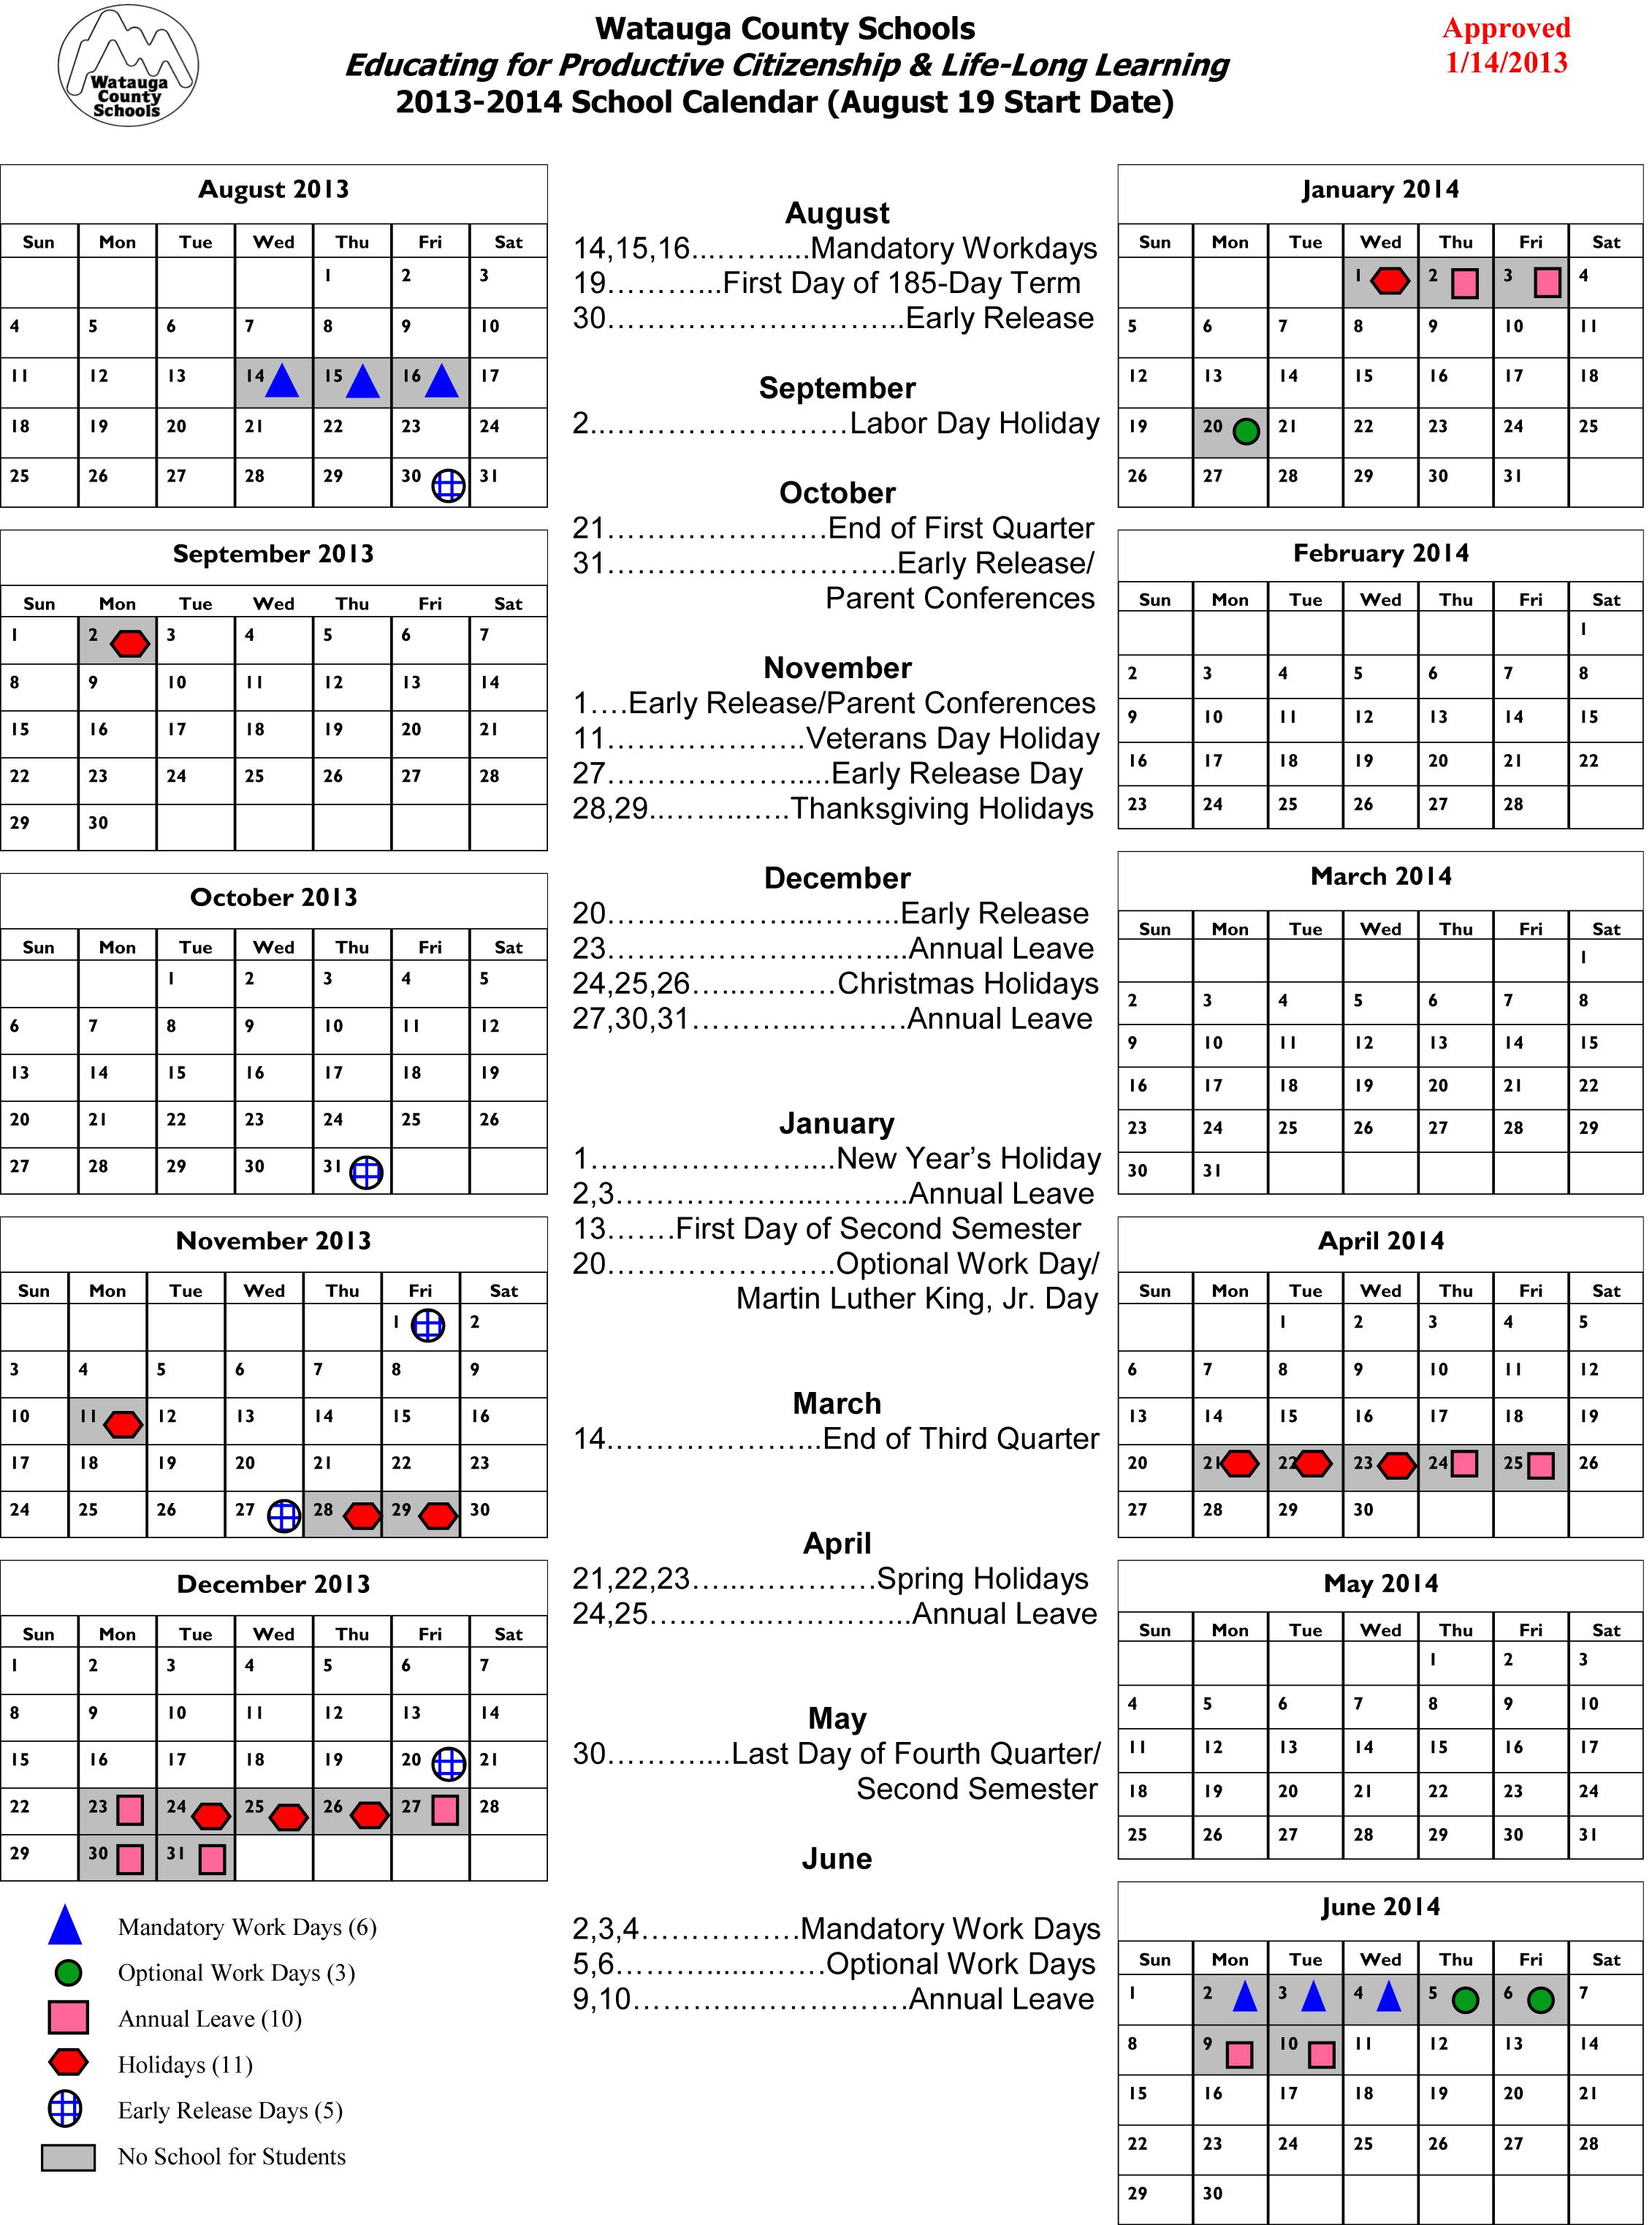 Watauga School Board Approves 2013-14 Calendar, First